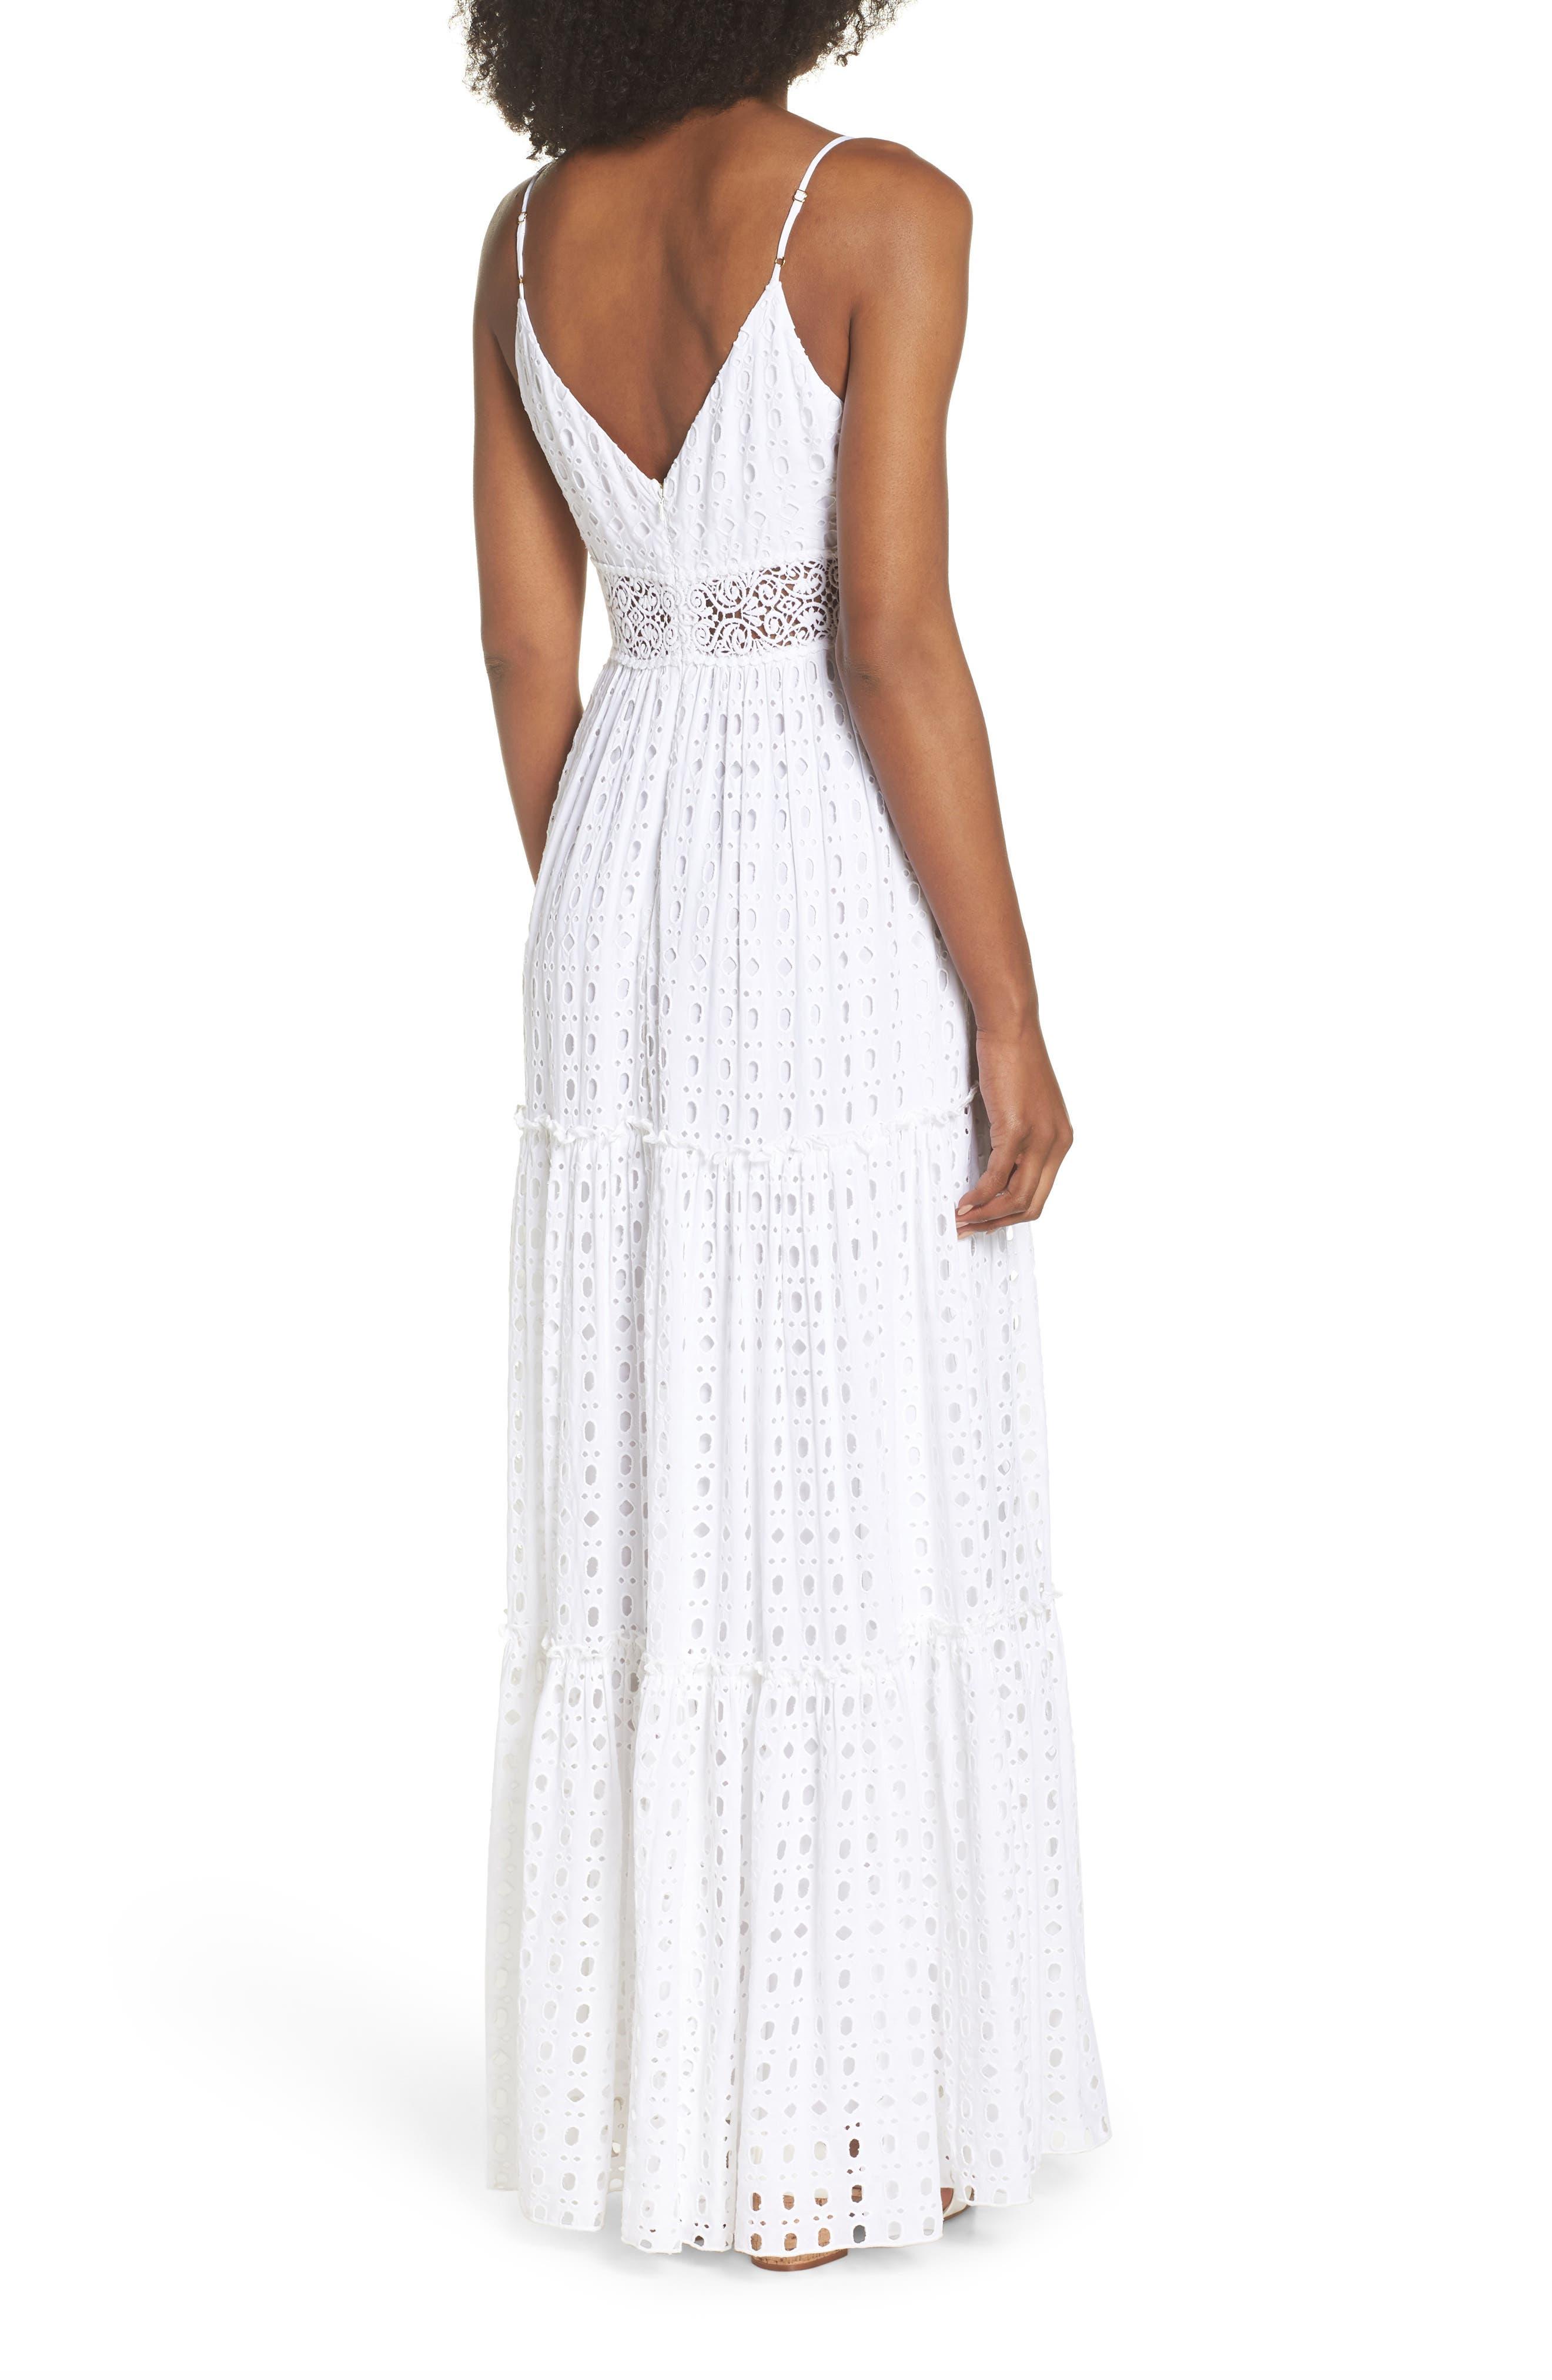 Melody Maxi Dress,                             Alternate thumbnail 2, color,                             Resort White Eyelet